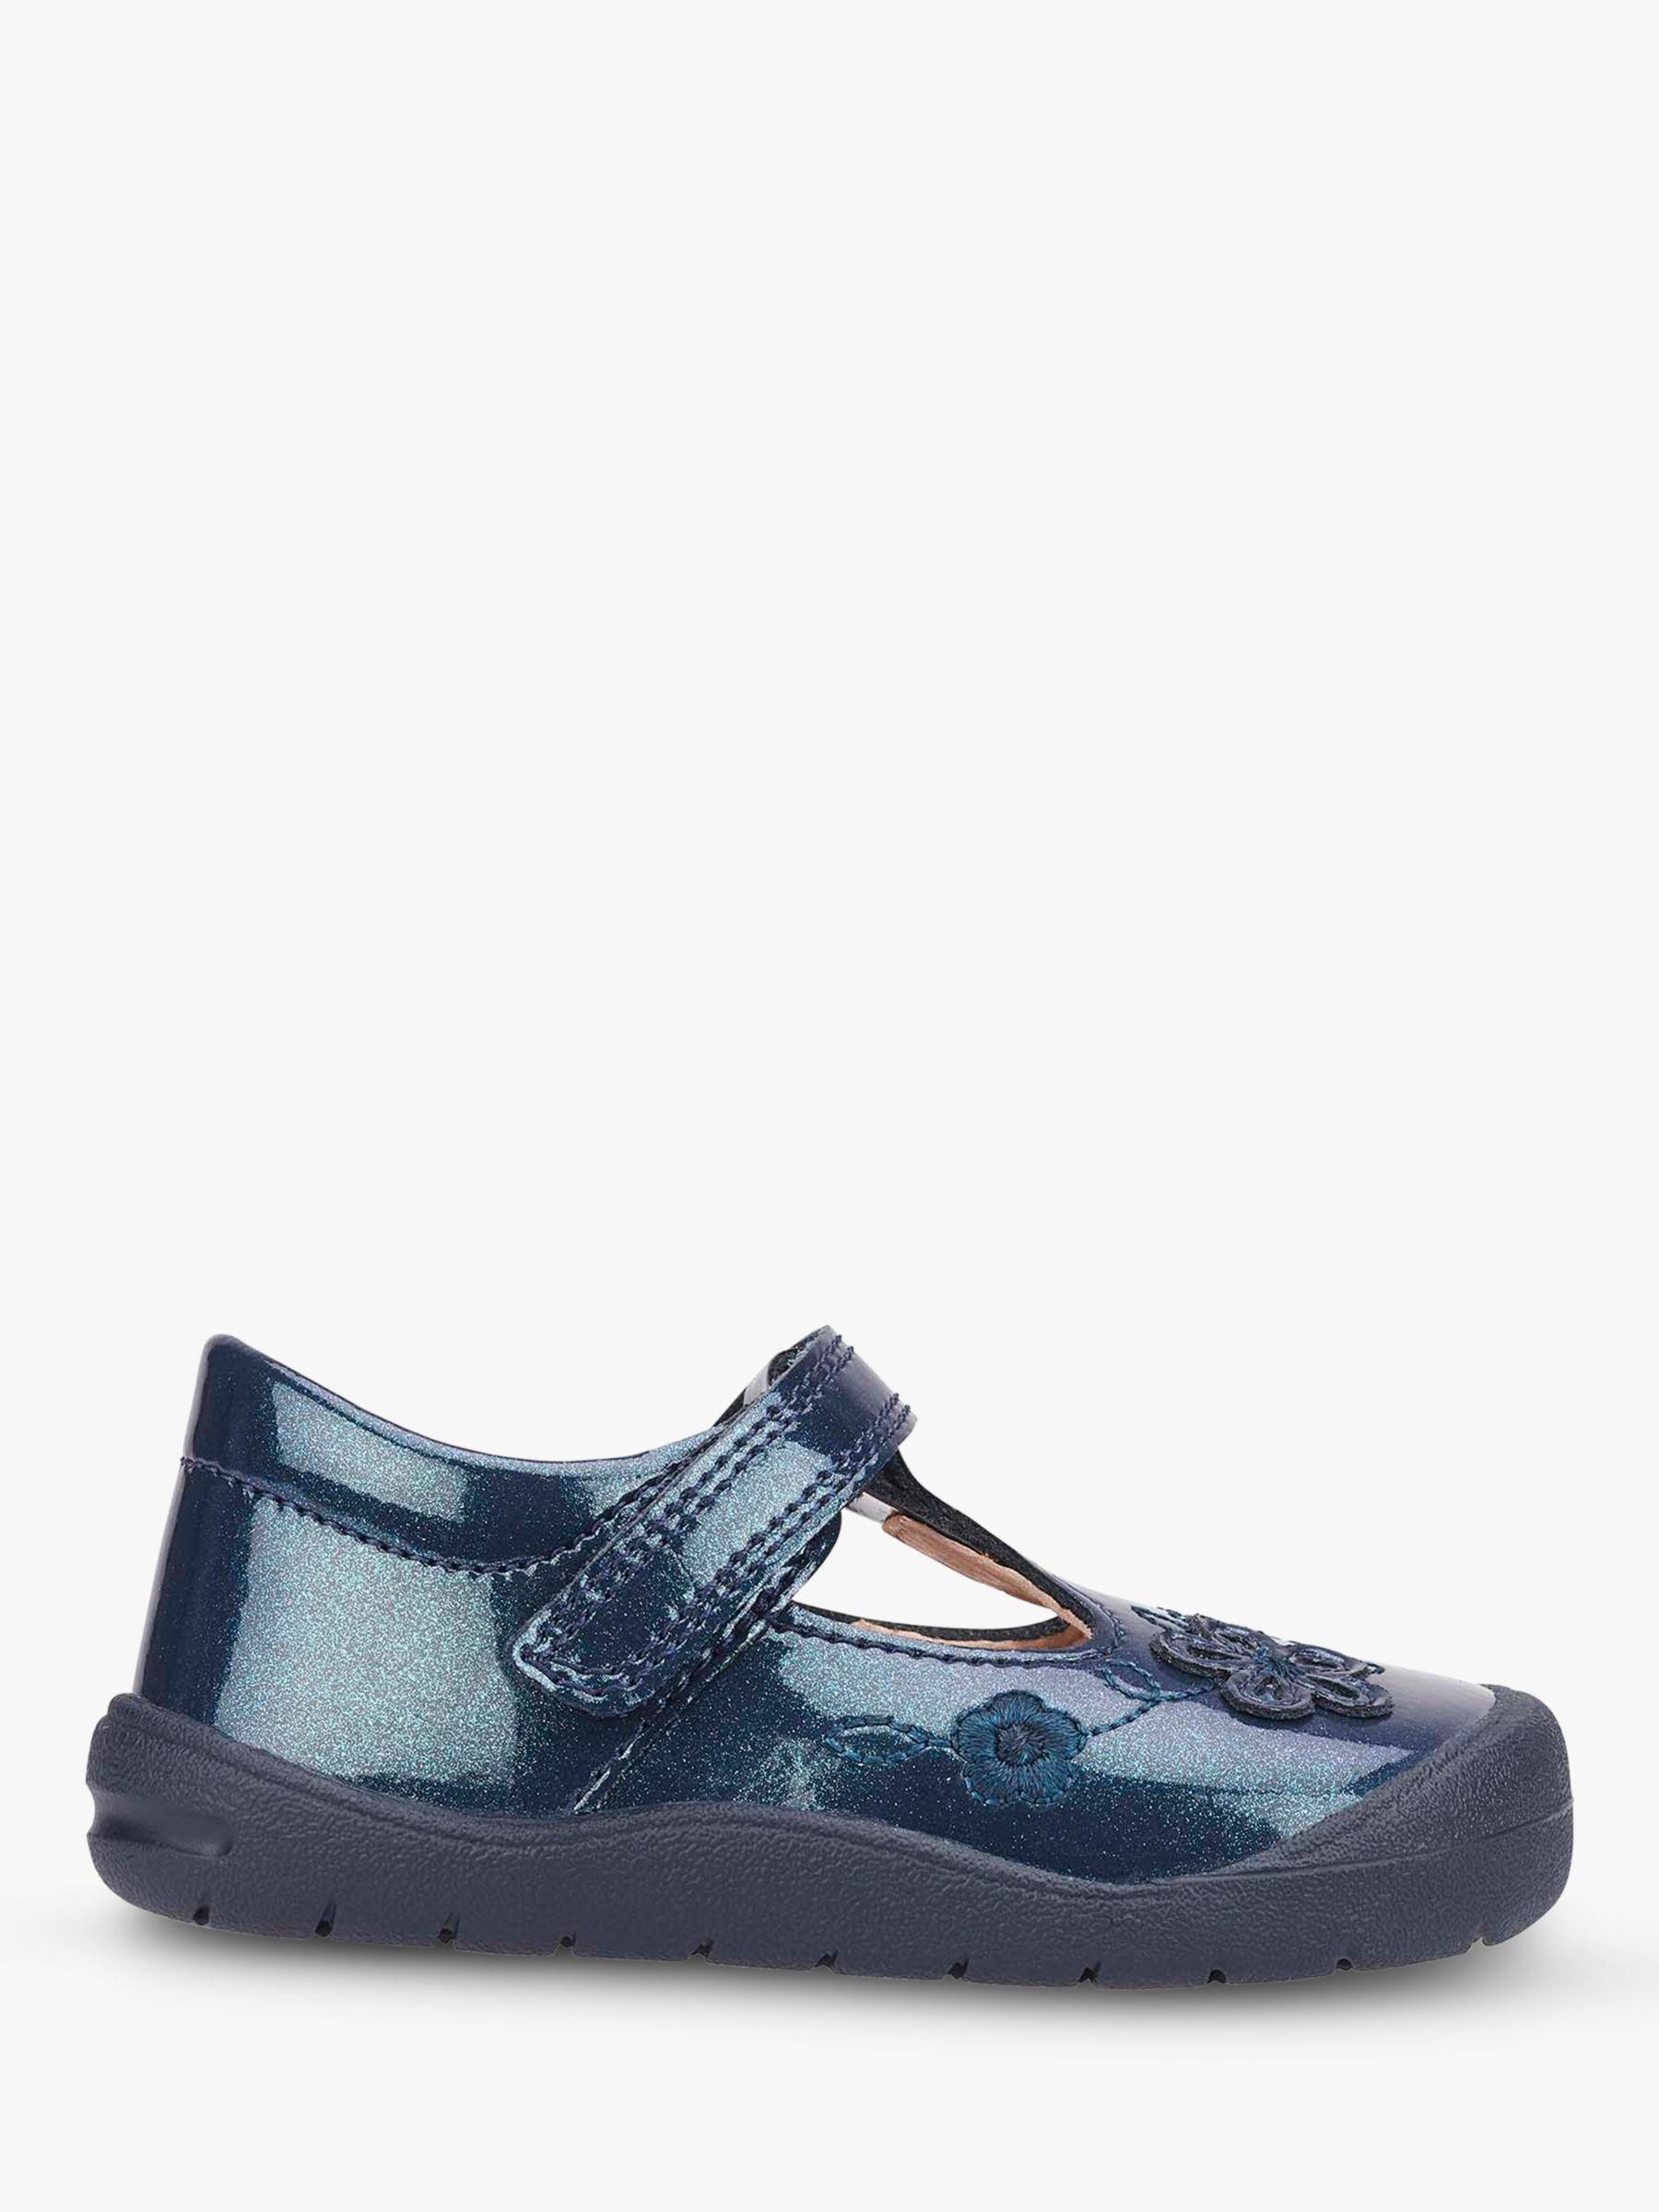 Start-Rite Start-rite Children's Mia First Shoes, Navy